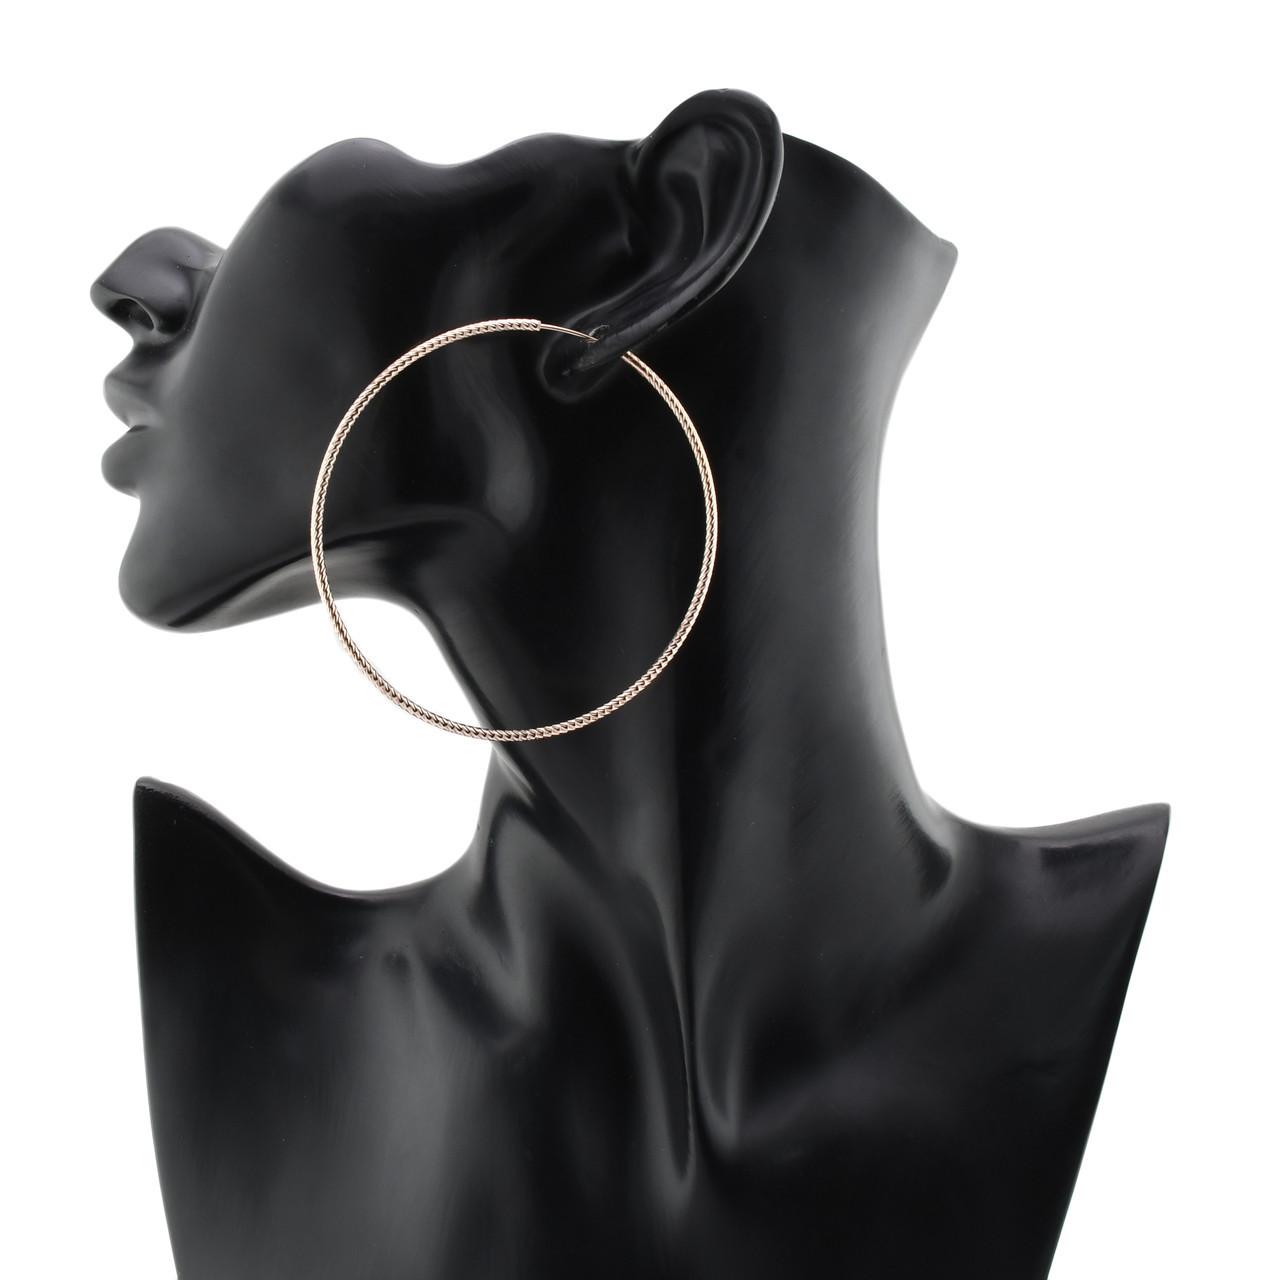 Серьги Xuping кольца код 21979 размер 70х2 мм вес 11 г позолота РО